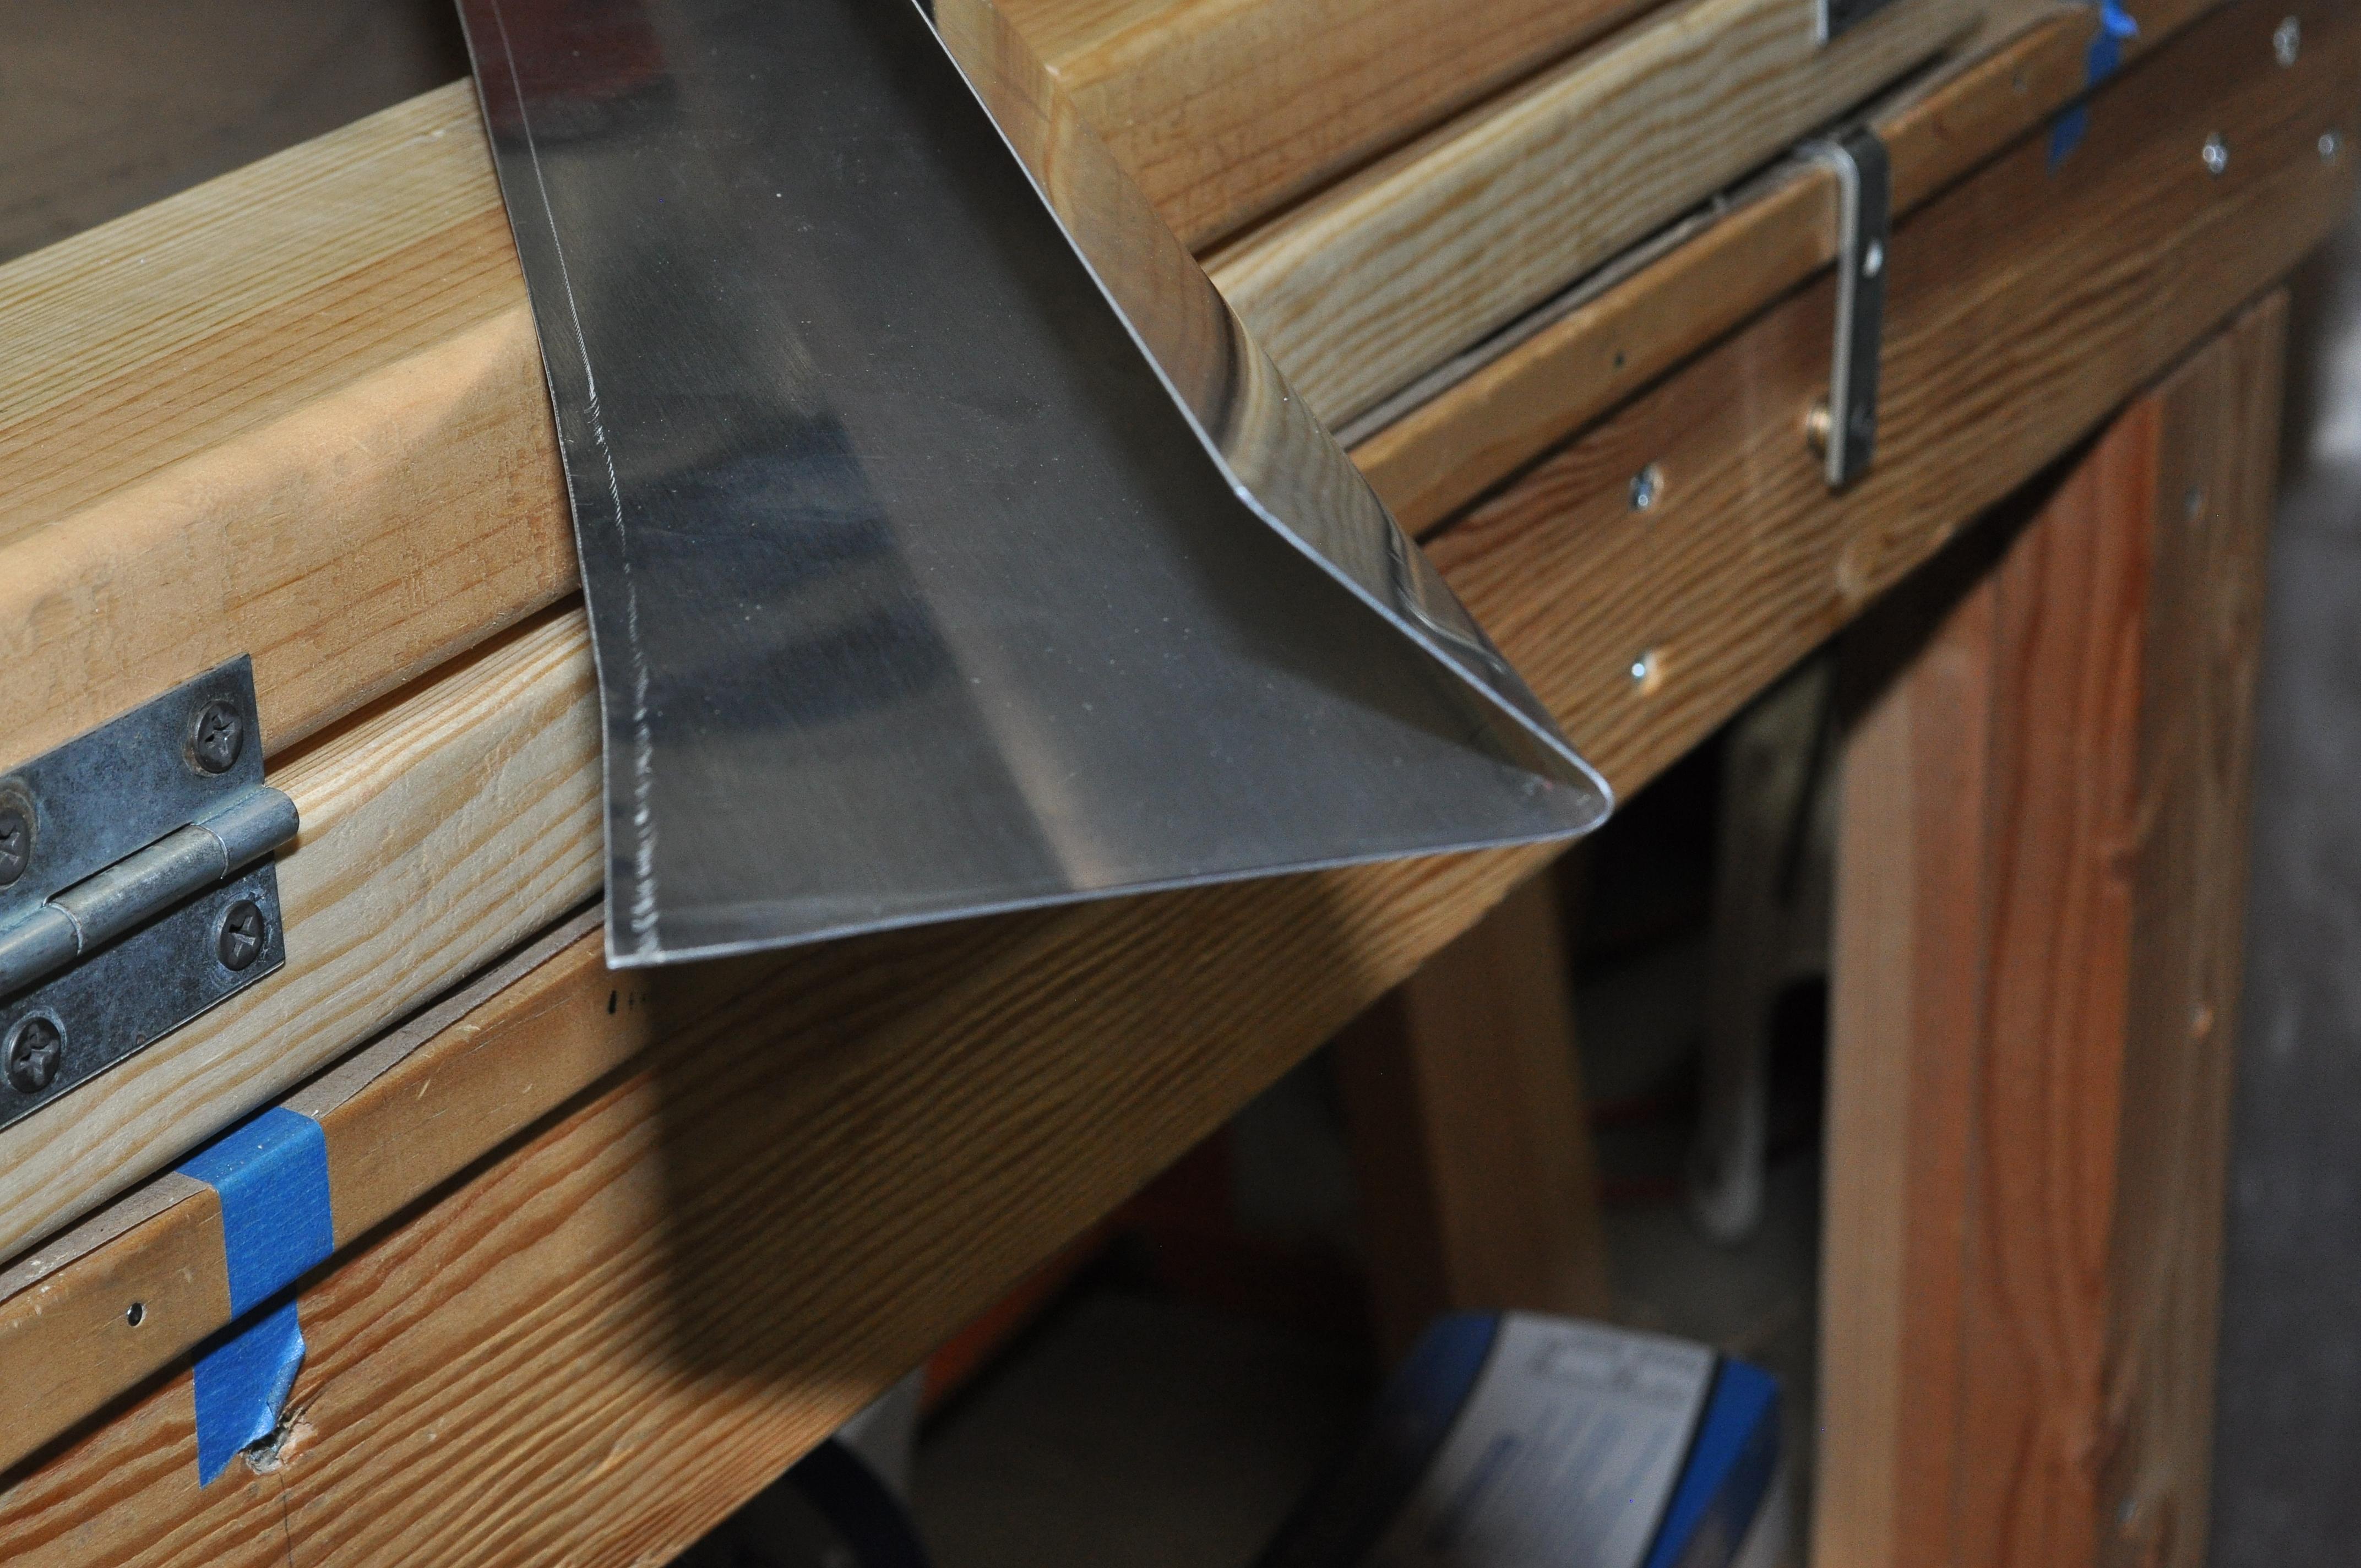 Sheet Metal Bending Brake For Dorsal And Ventral Fins